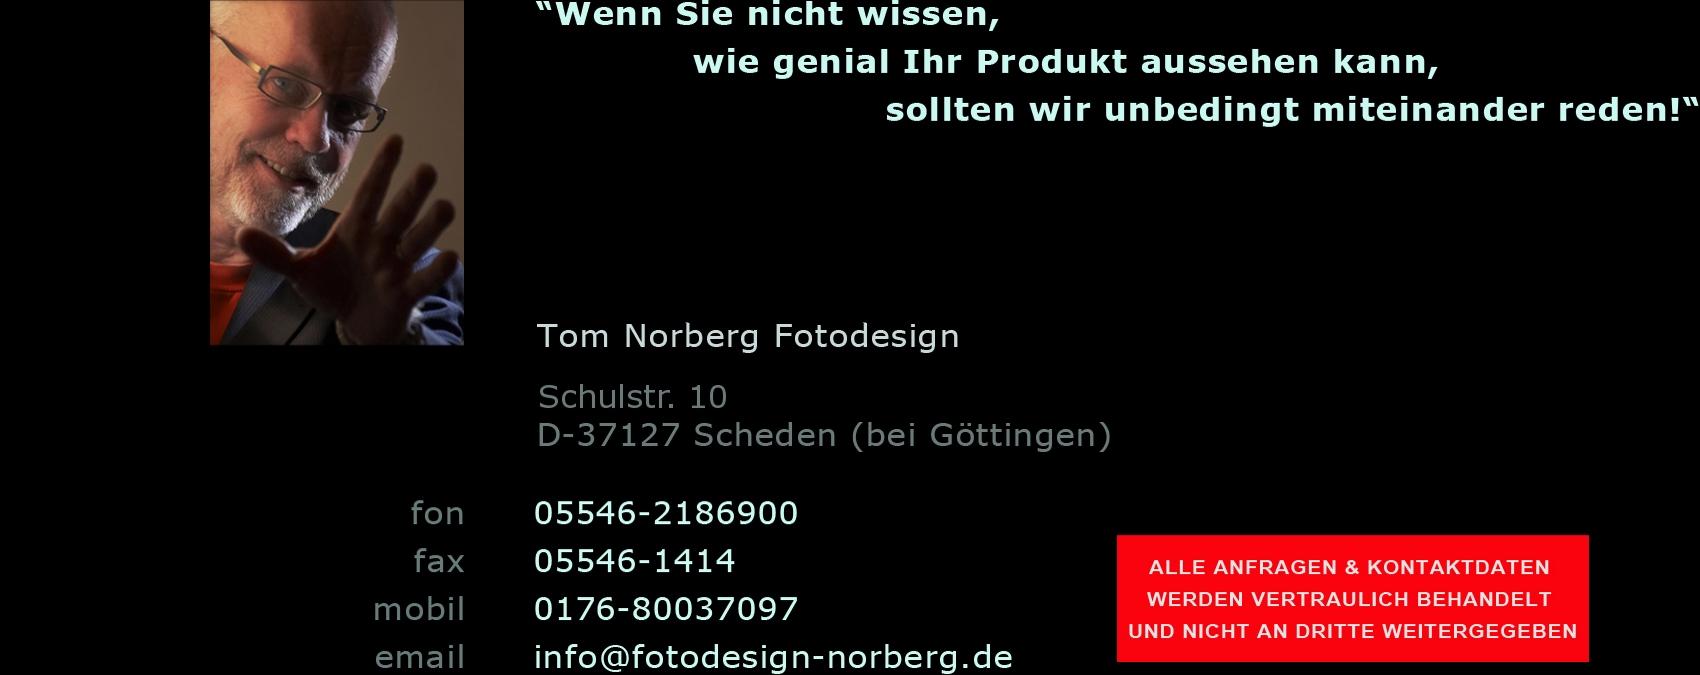 Tom Norberg